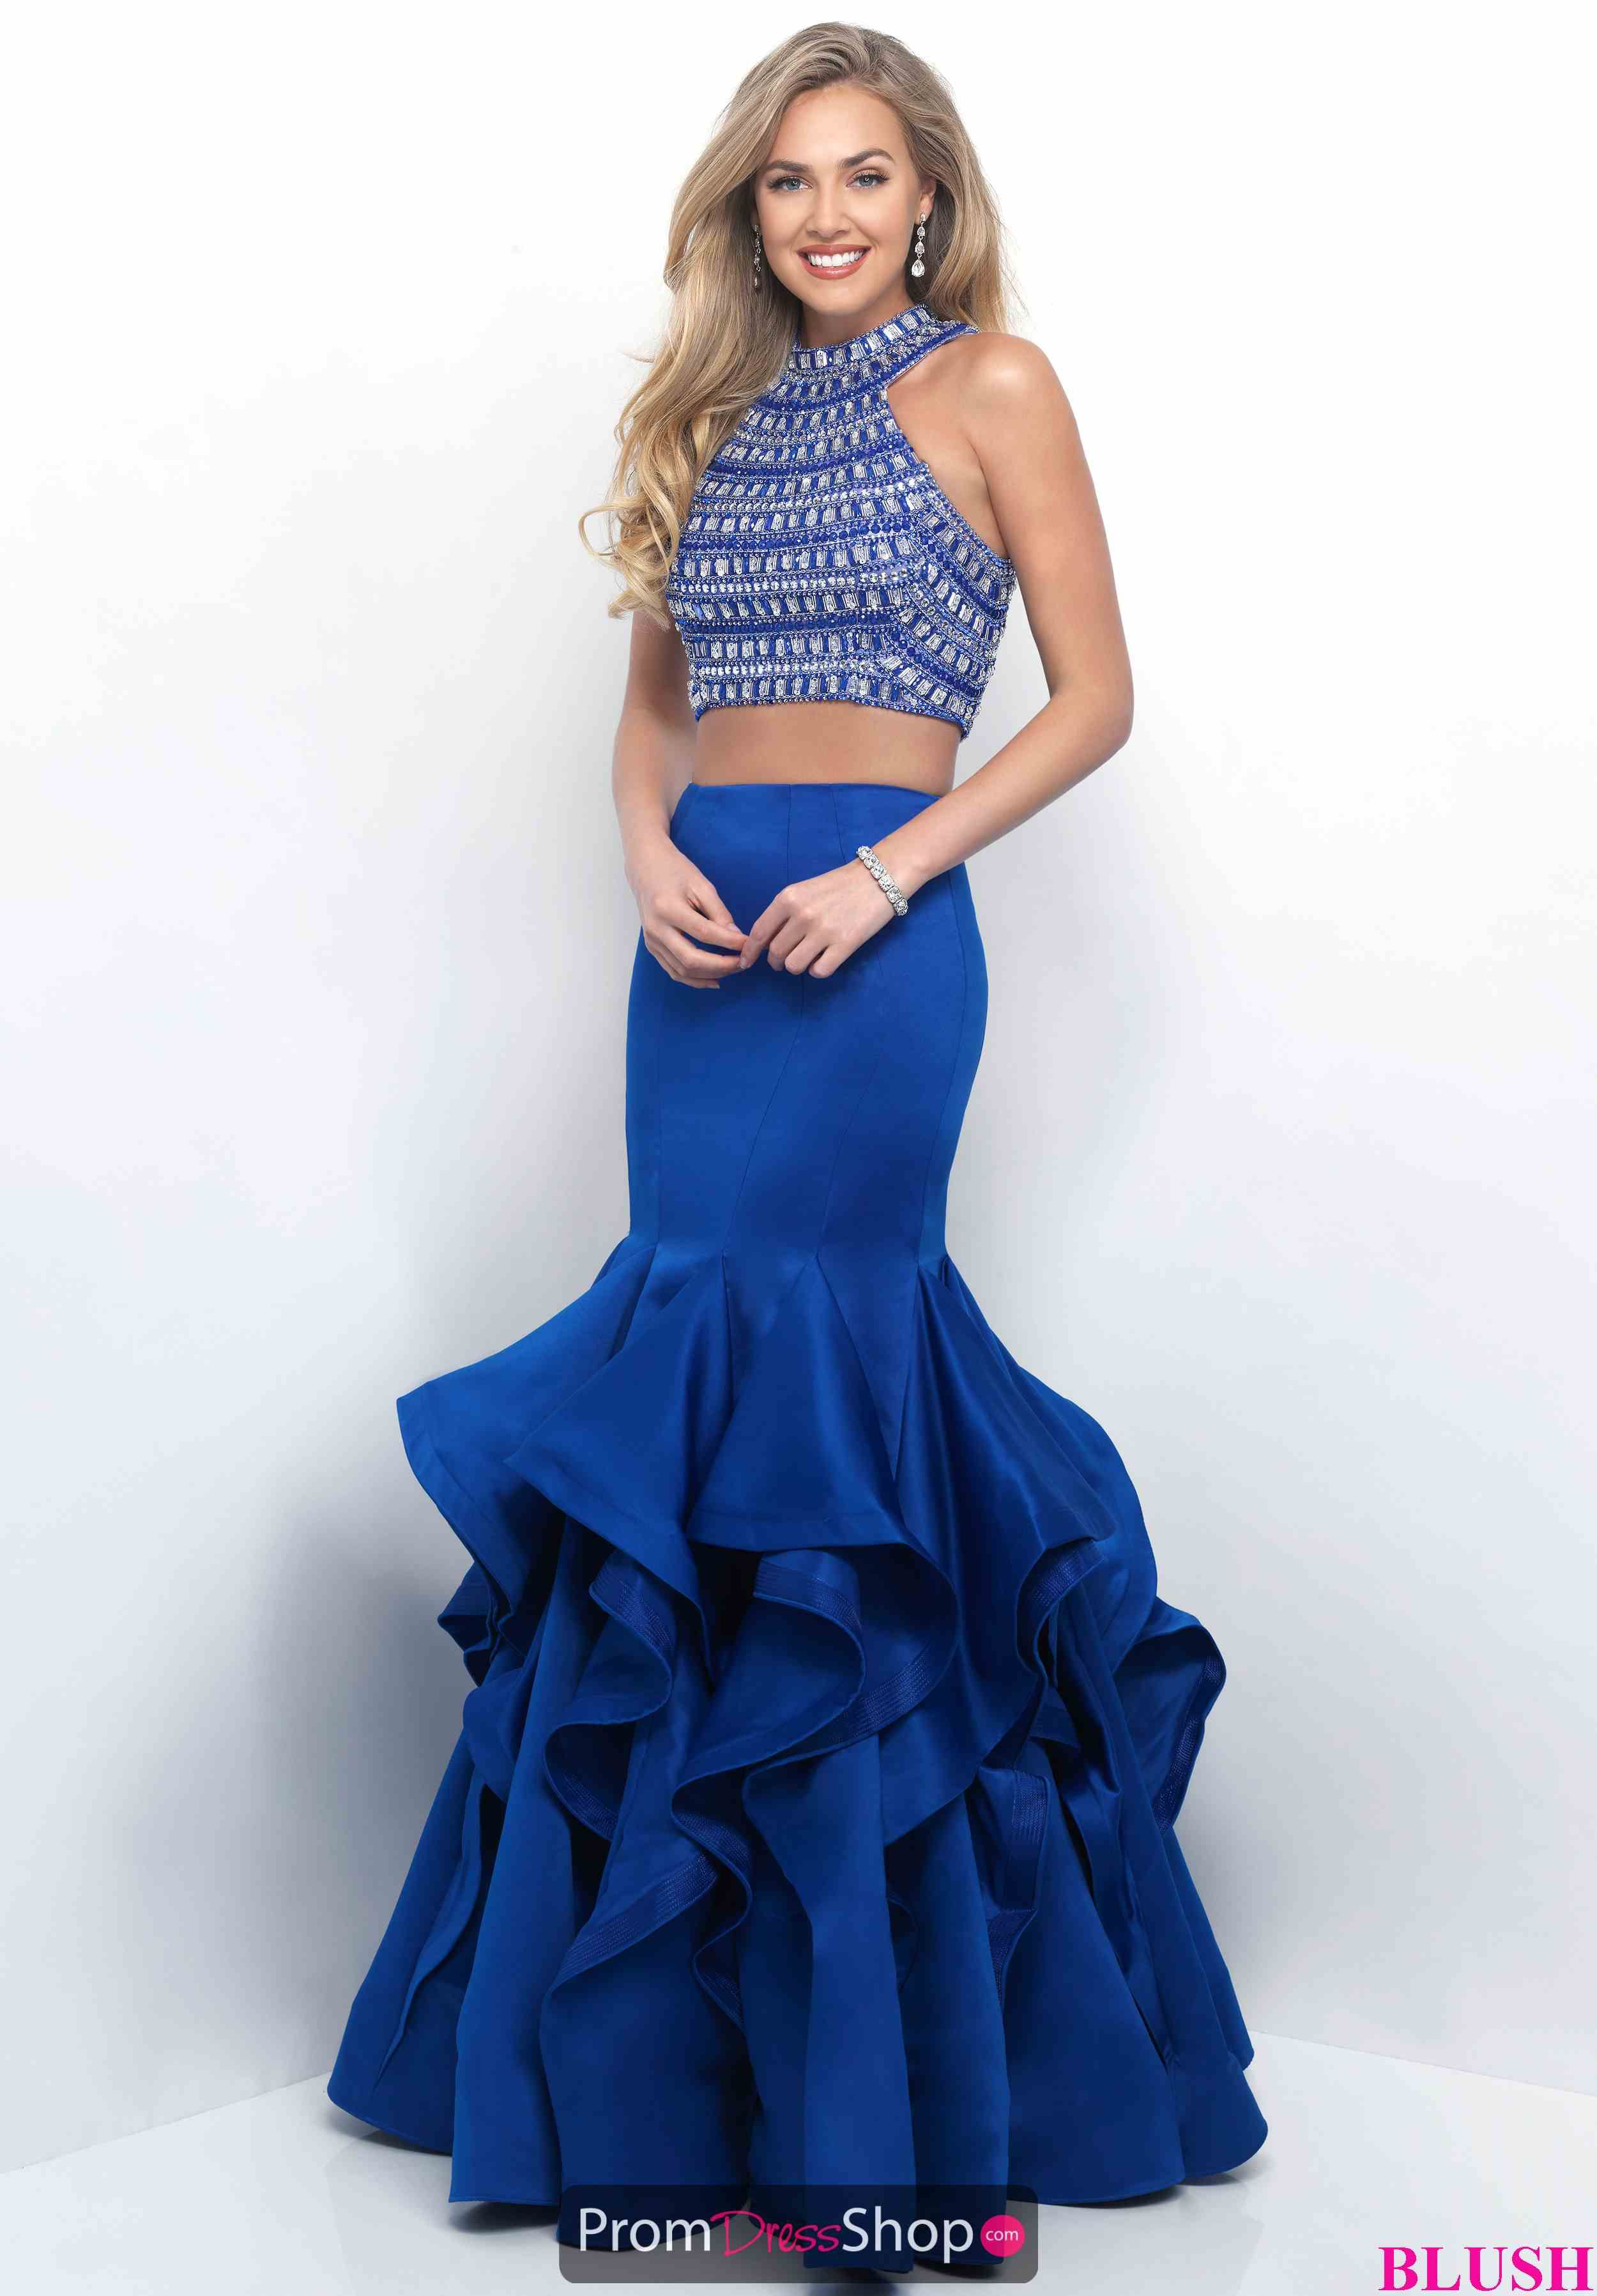 5729054b1f9 Two Piece Mermaid Prom Dresses 2017 - Data Dynamic AG